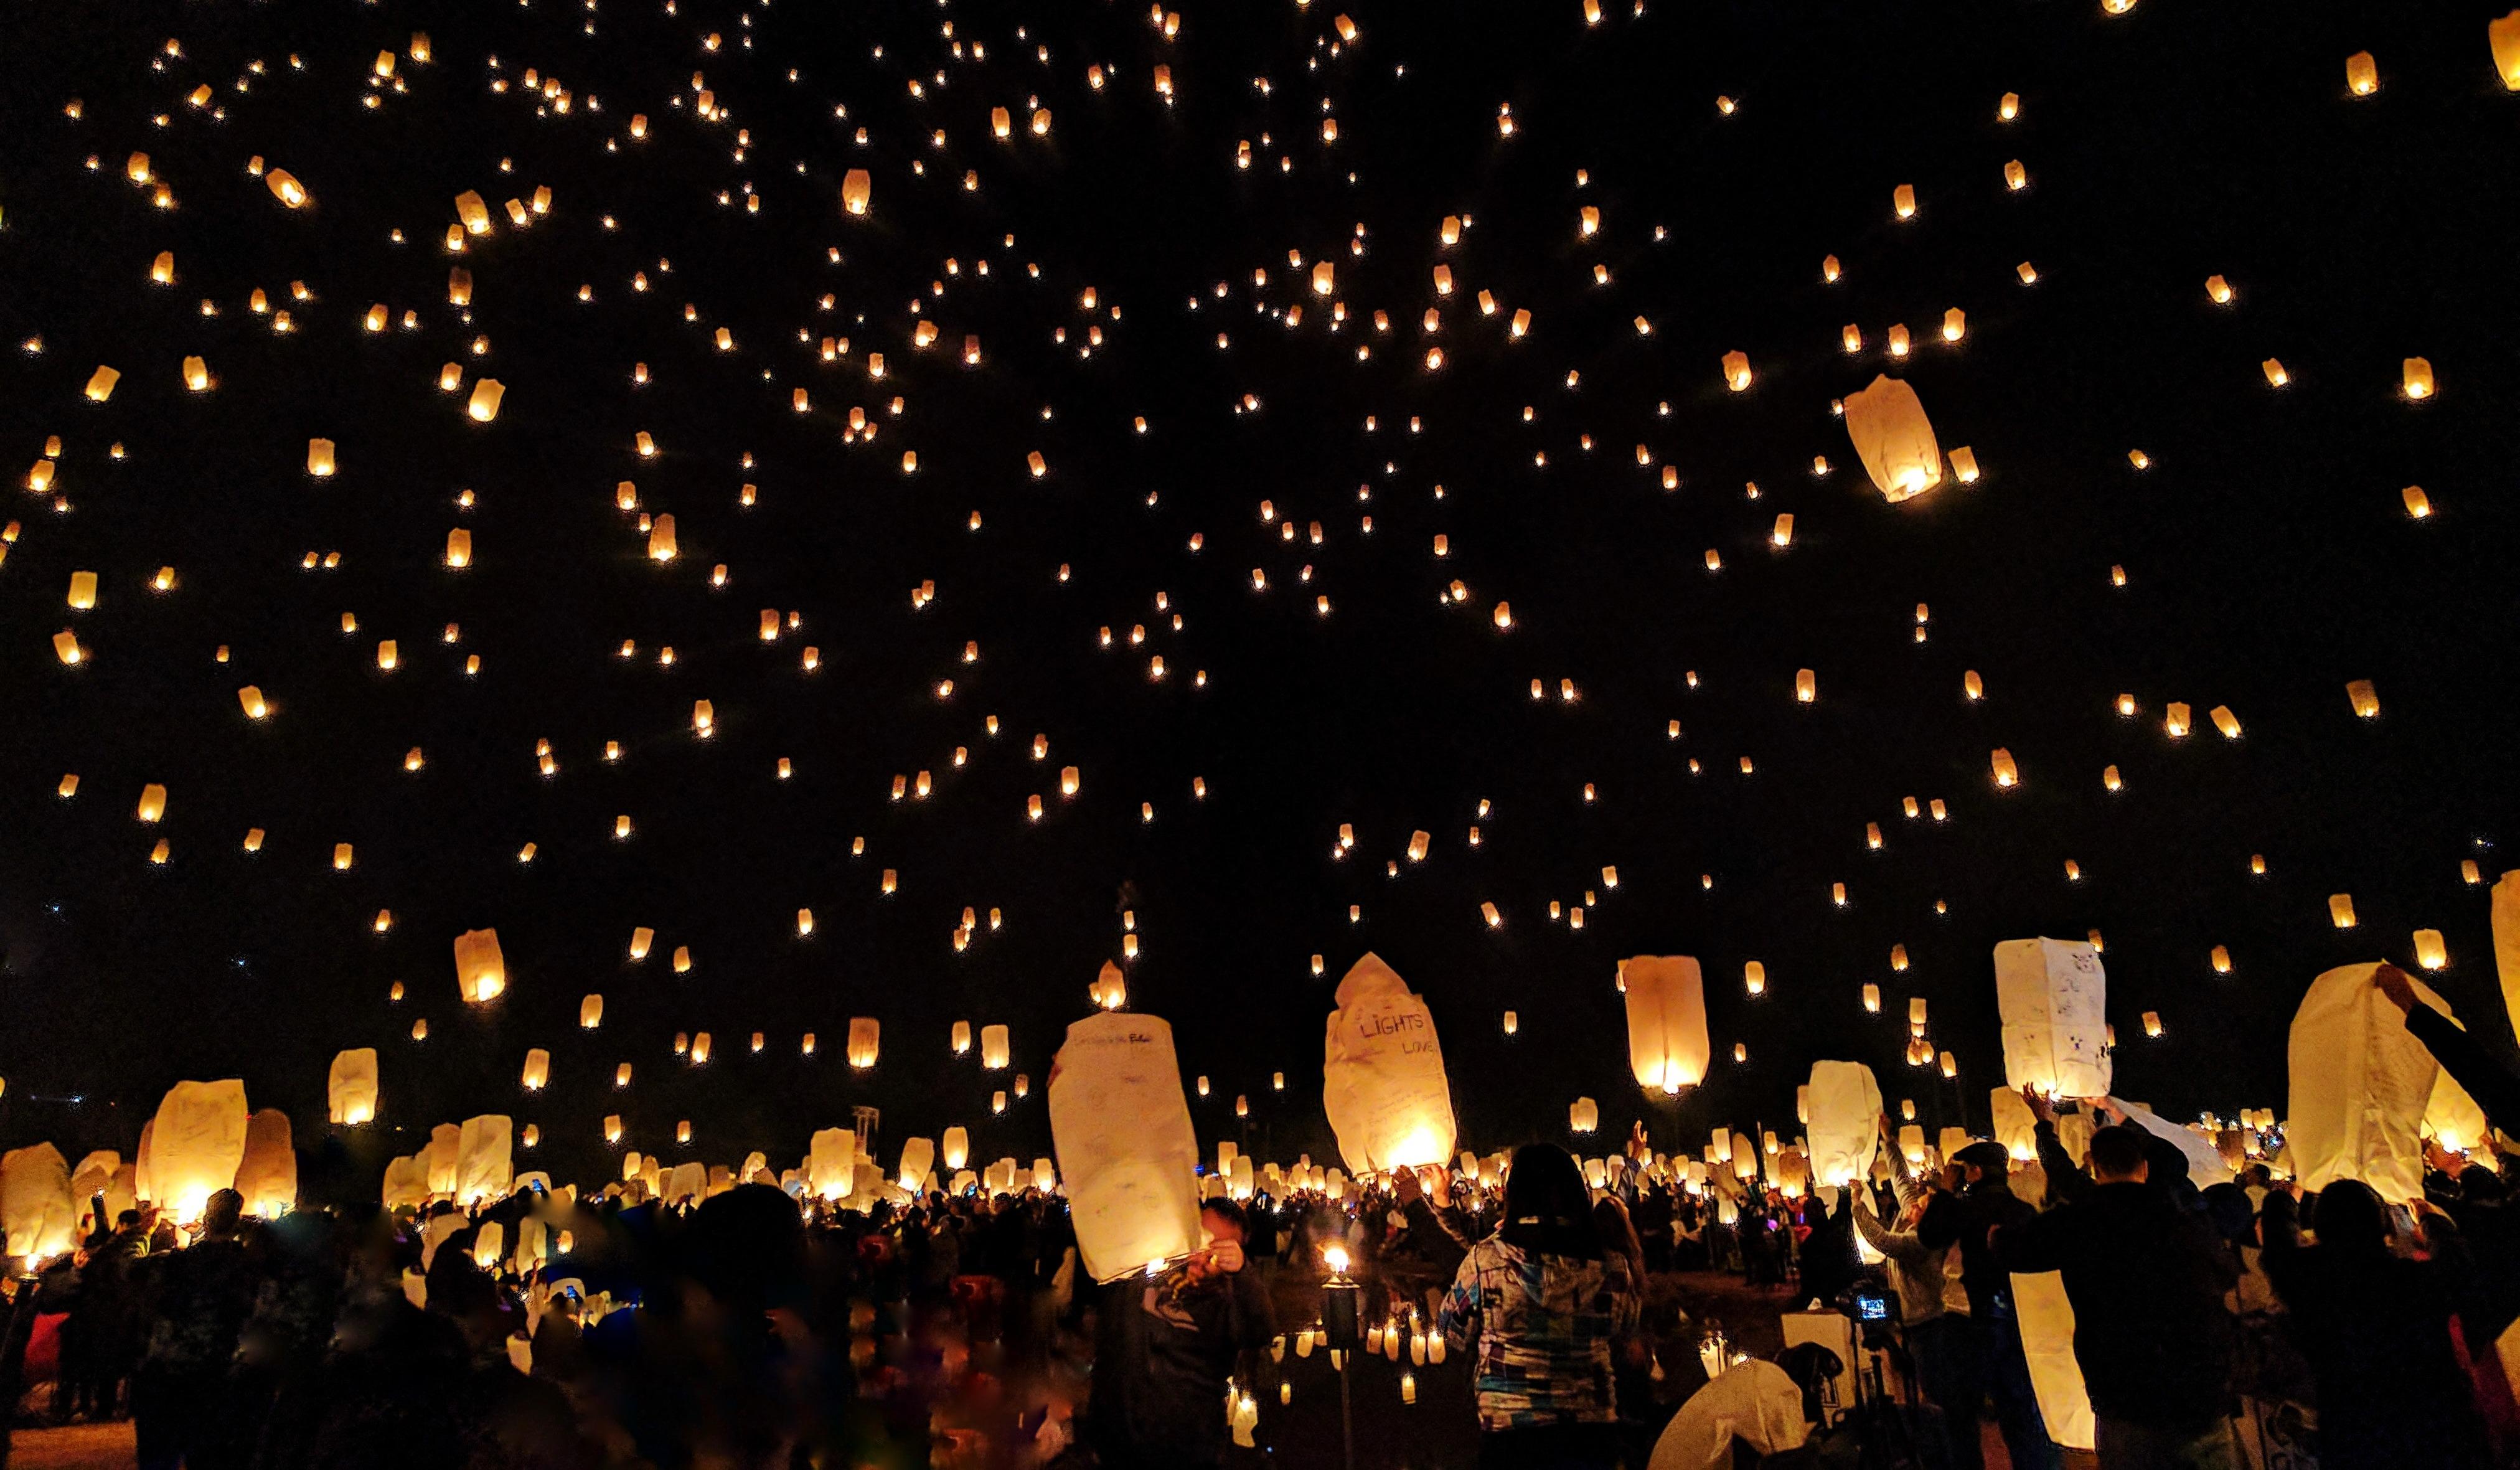 pexels-abby-kihano-chine-lanterne-fete